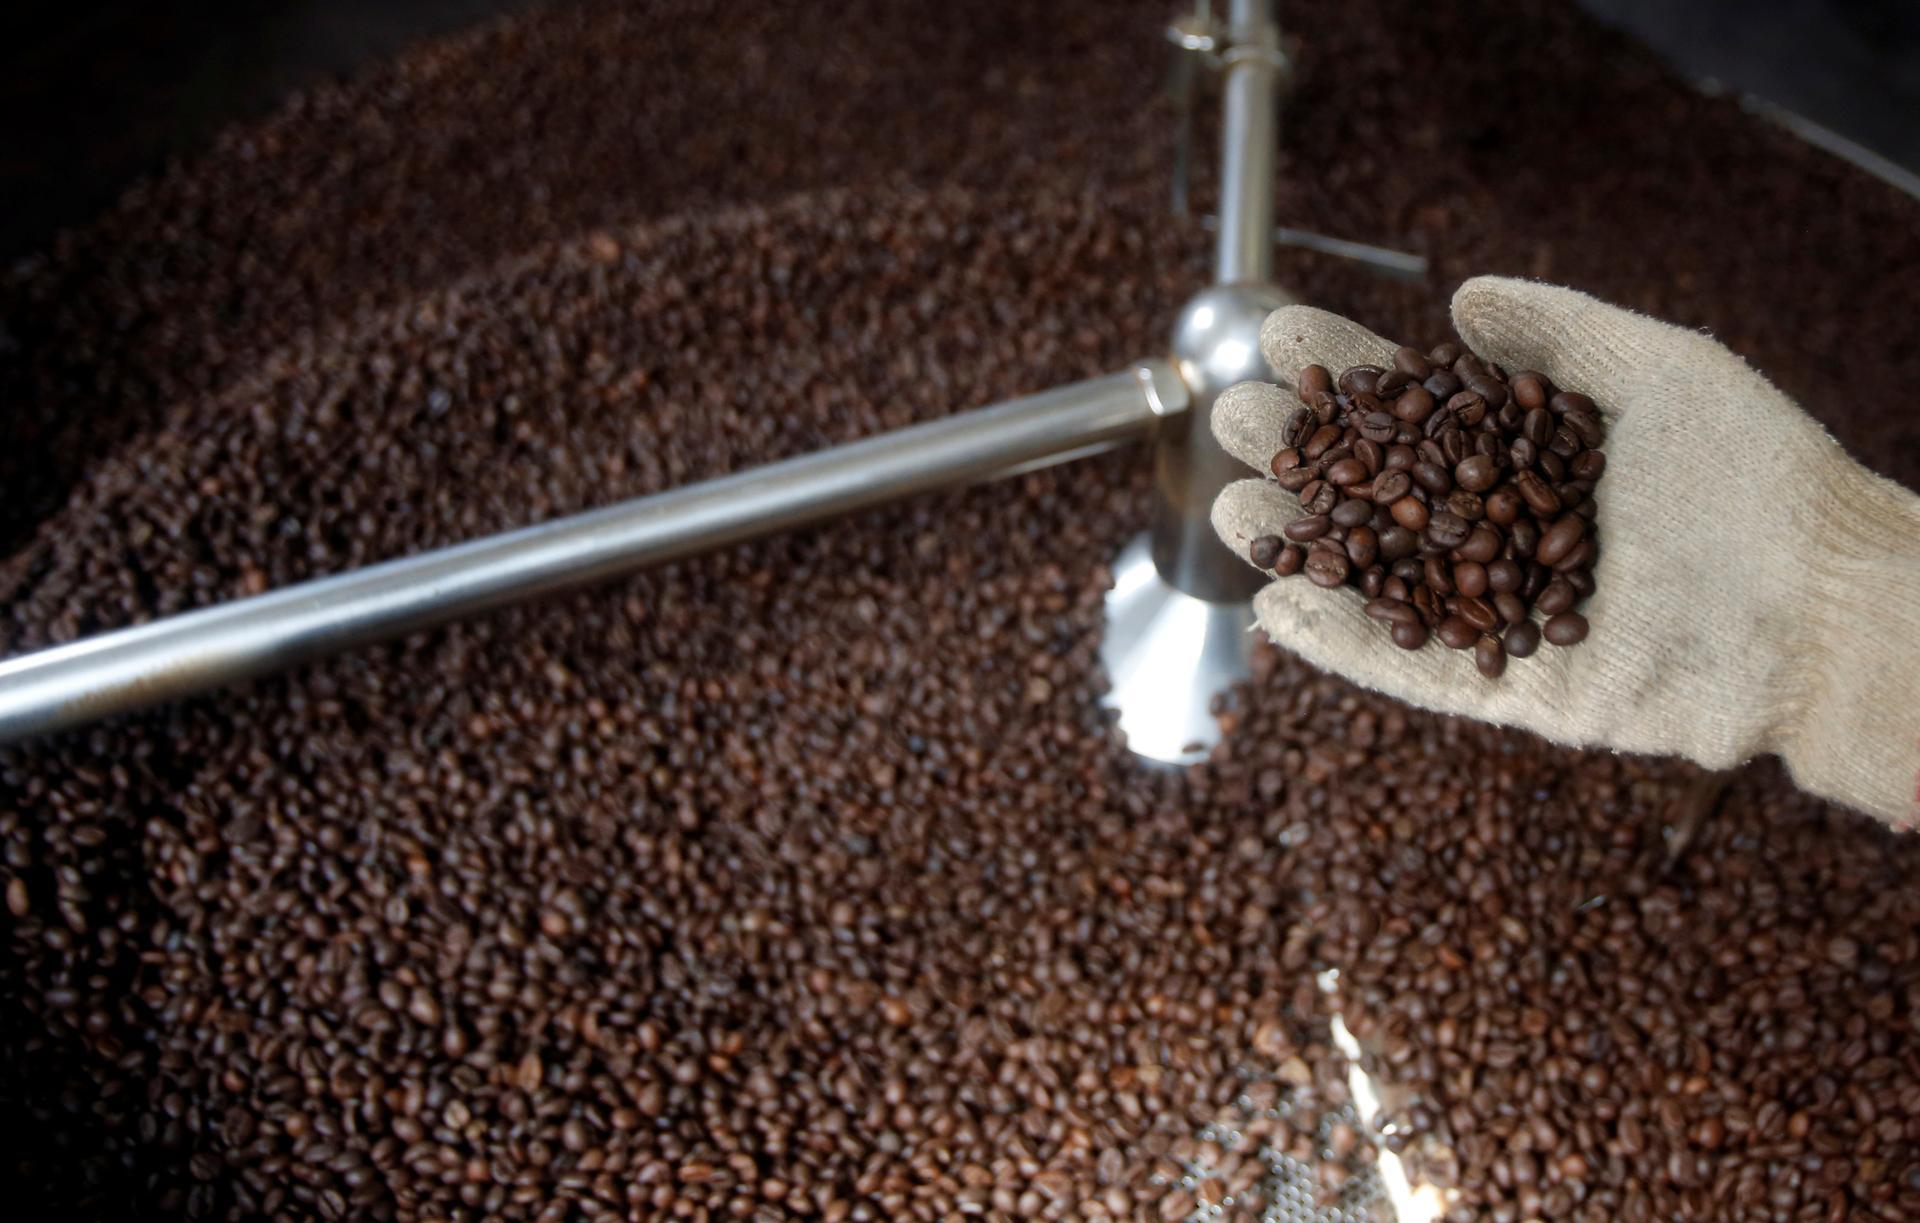 Asia Coffee-Vietnam prices inch higher on supply crunch, fresh virus curbs